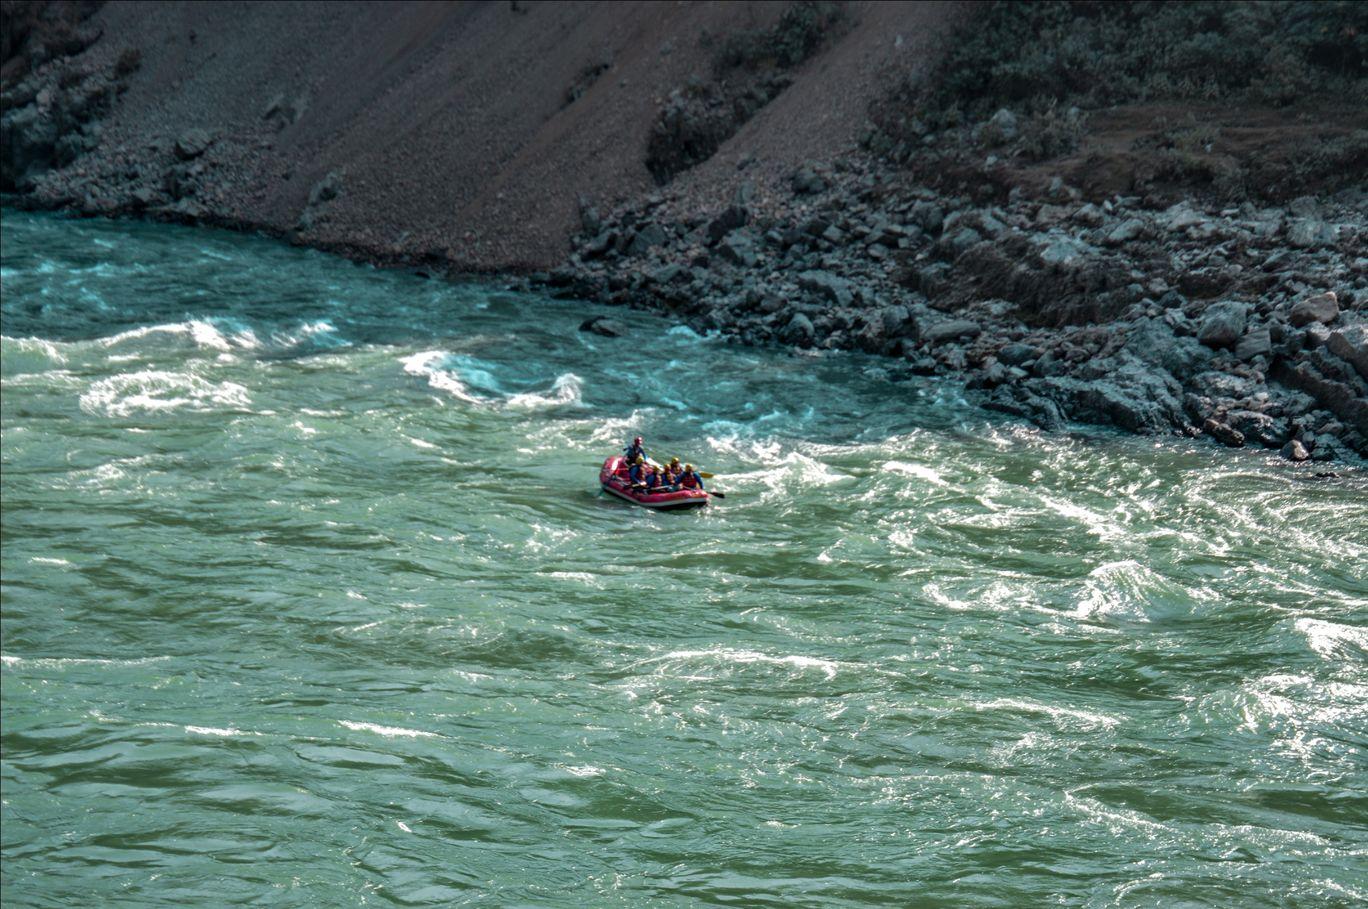 Photo of Rafting Rishikesh - Tayal Adventure Rishikesh By Mountain Balak